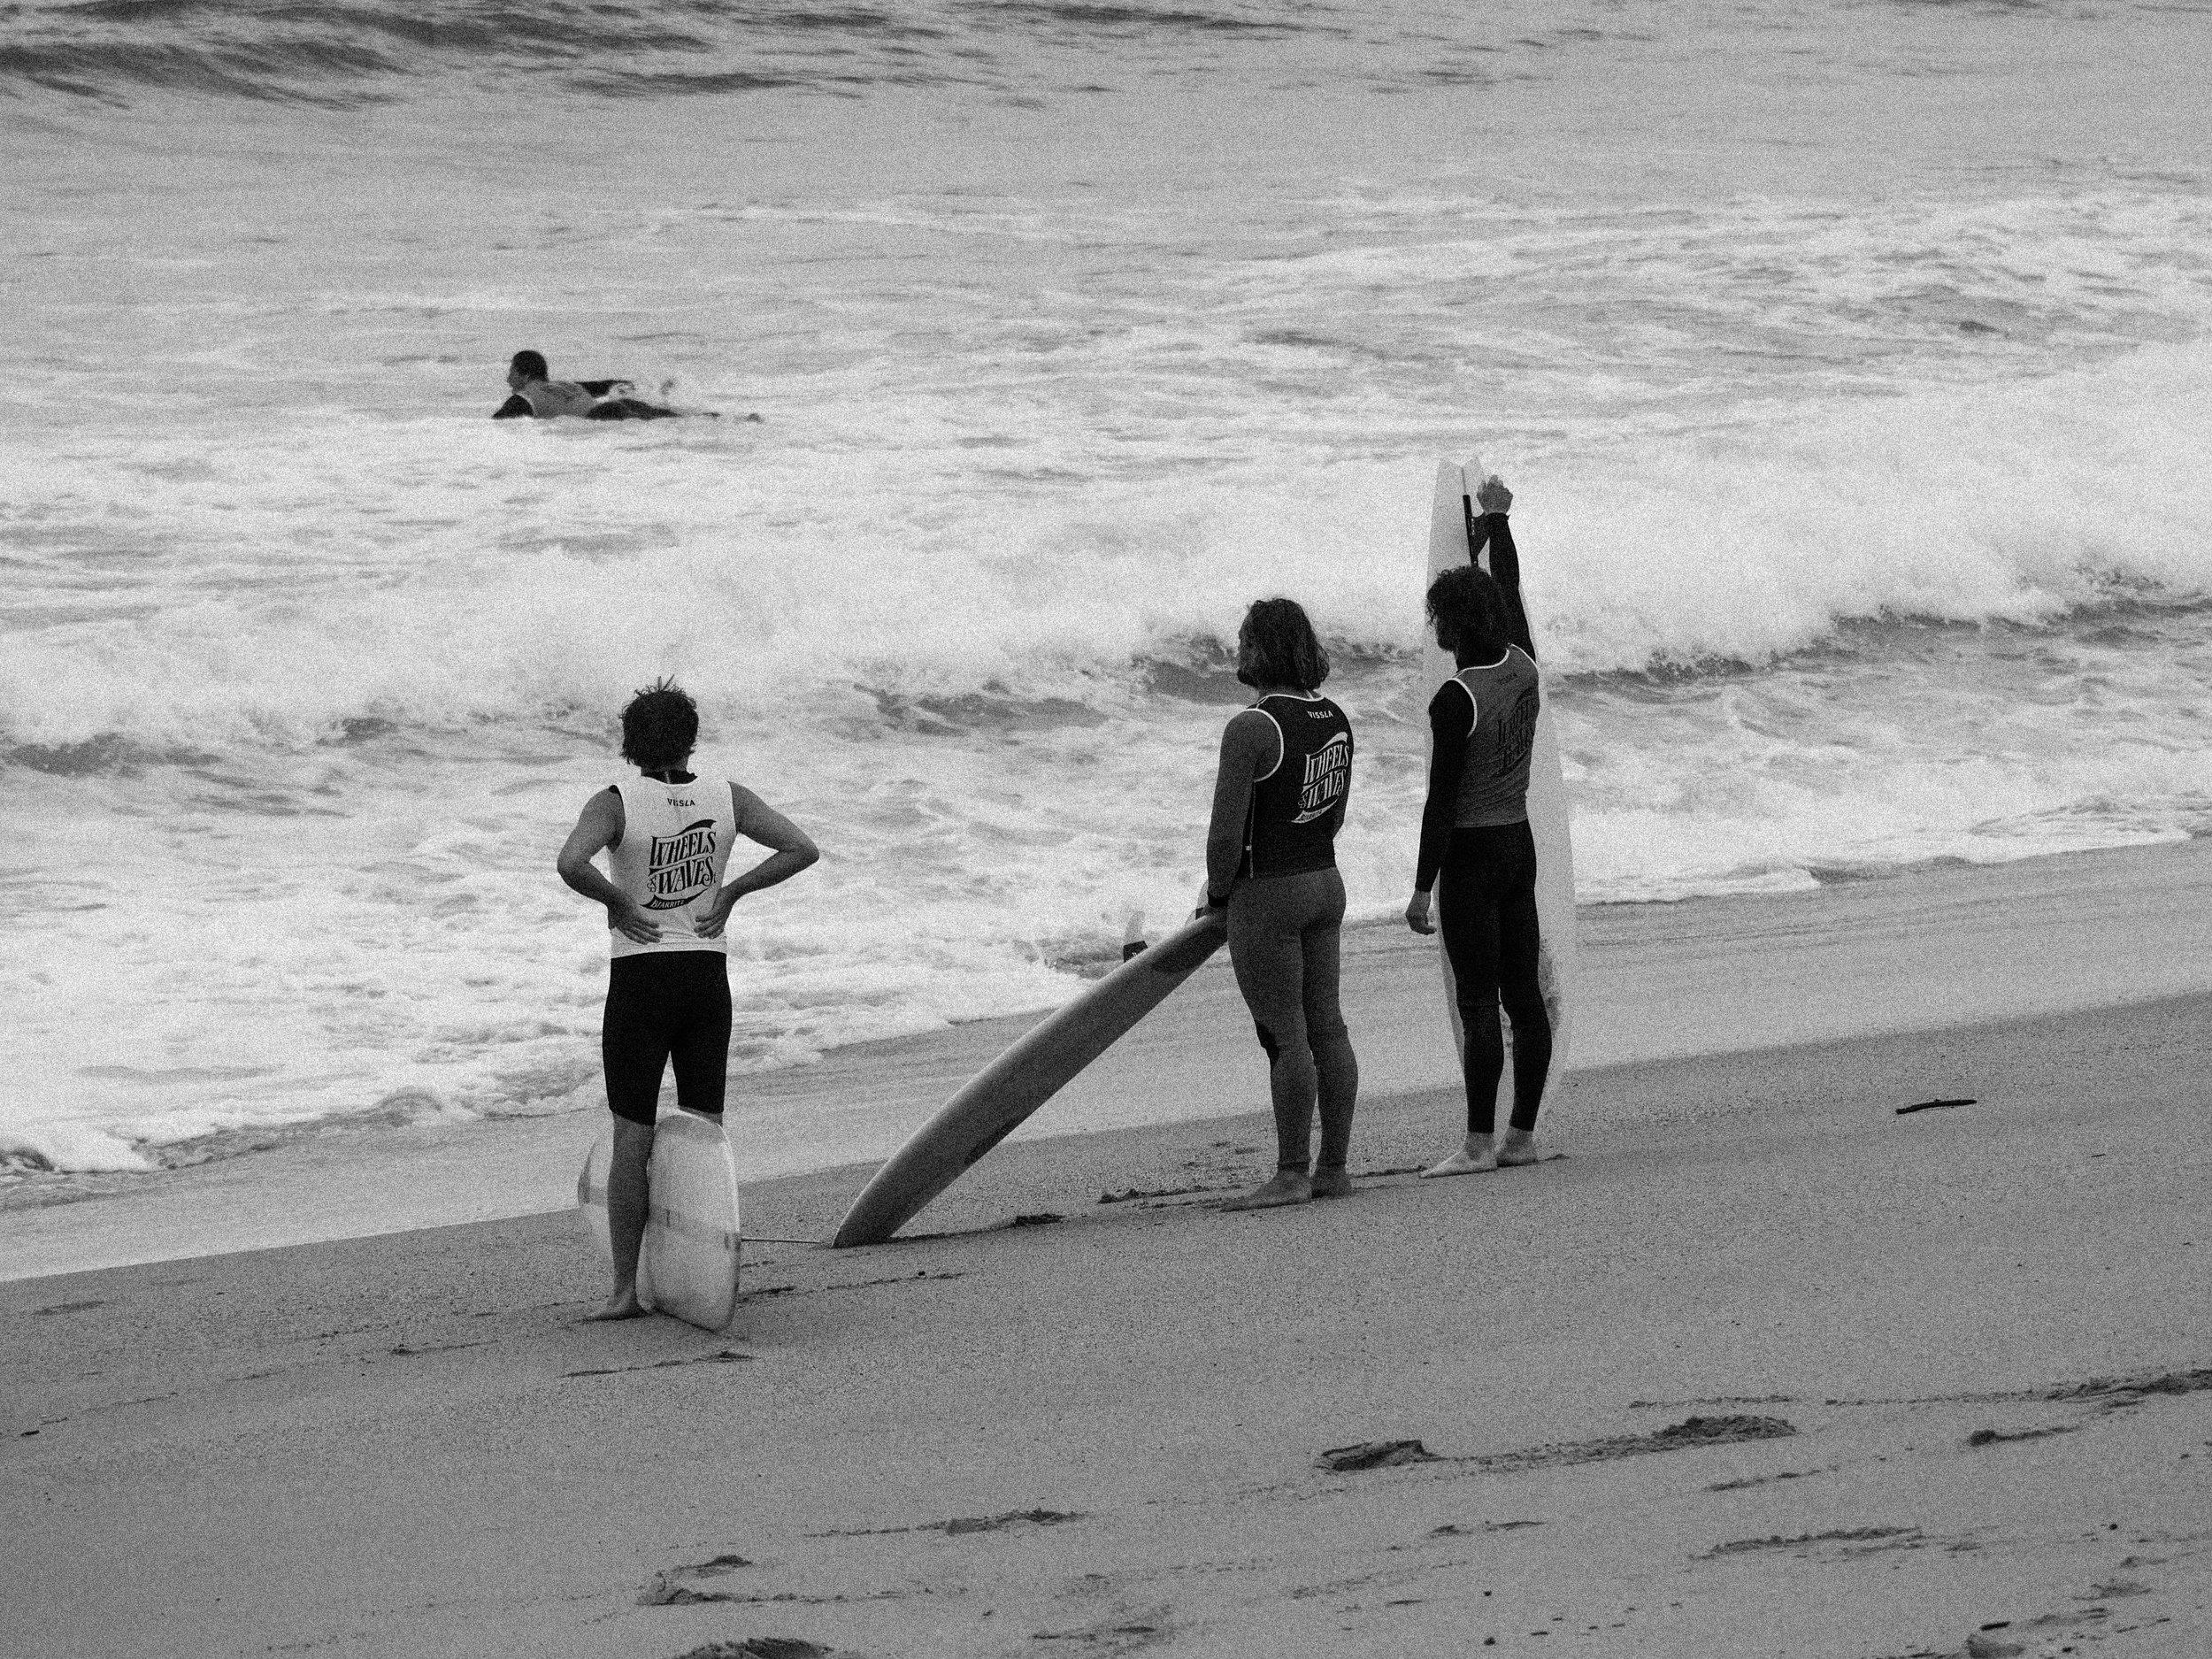 wheels_and_waves_biarritz_2019_salt_water